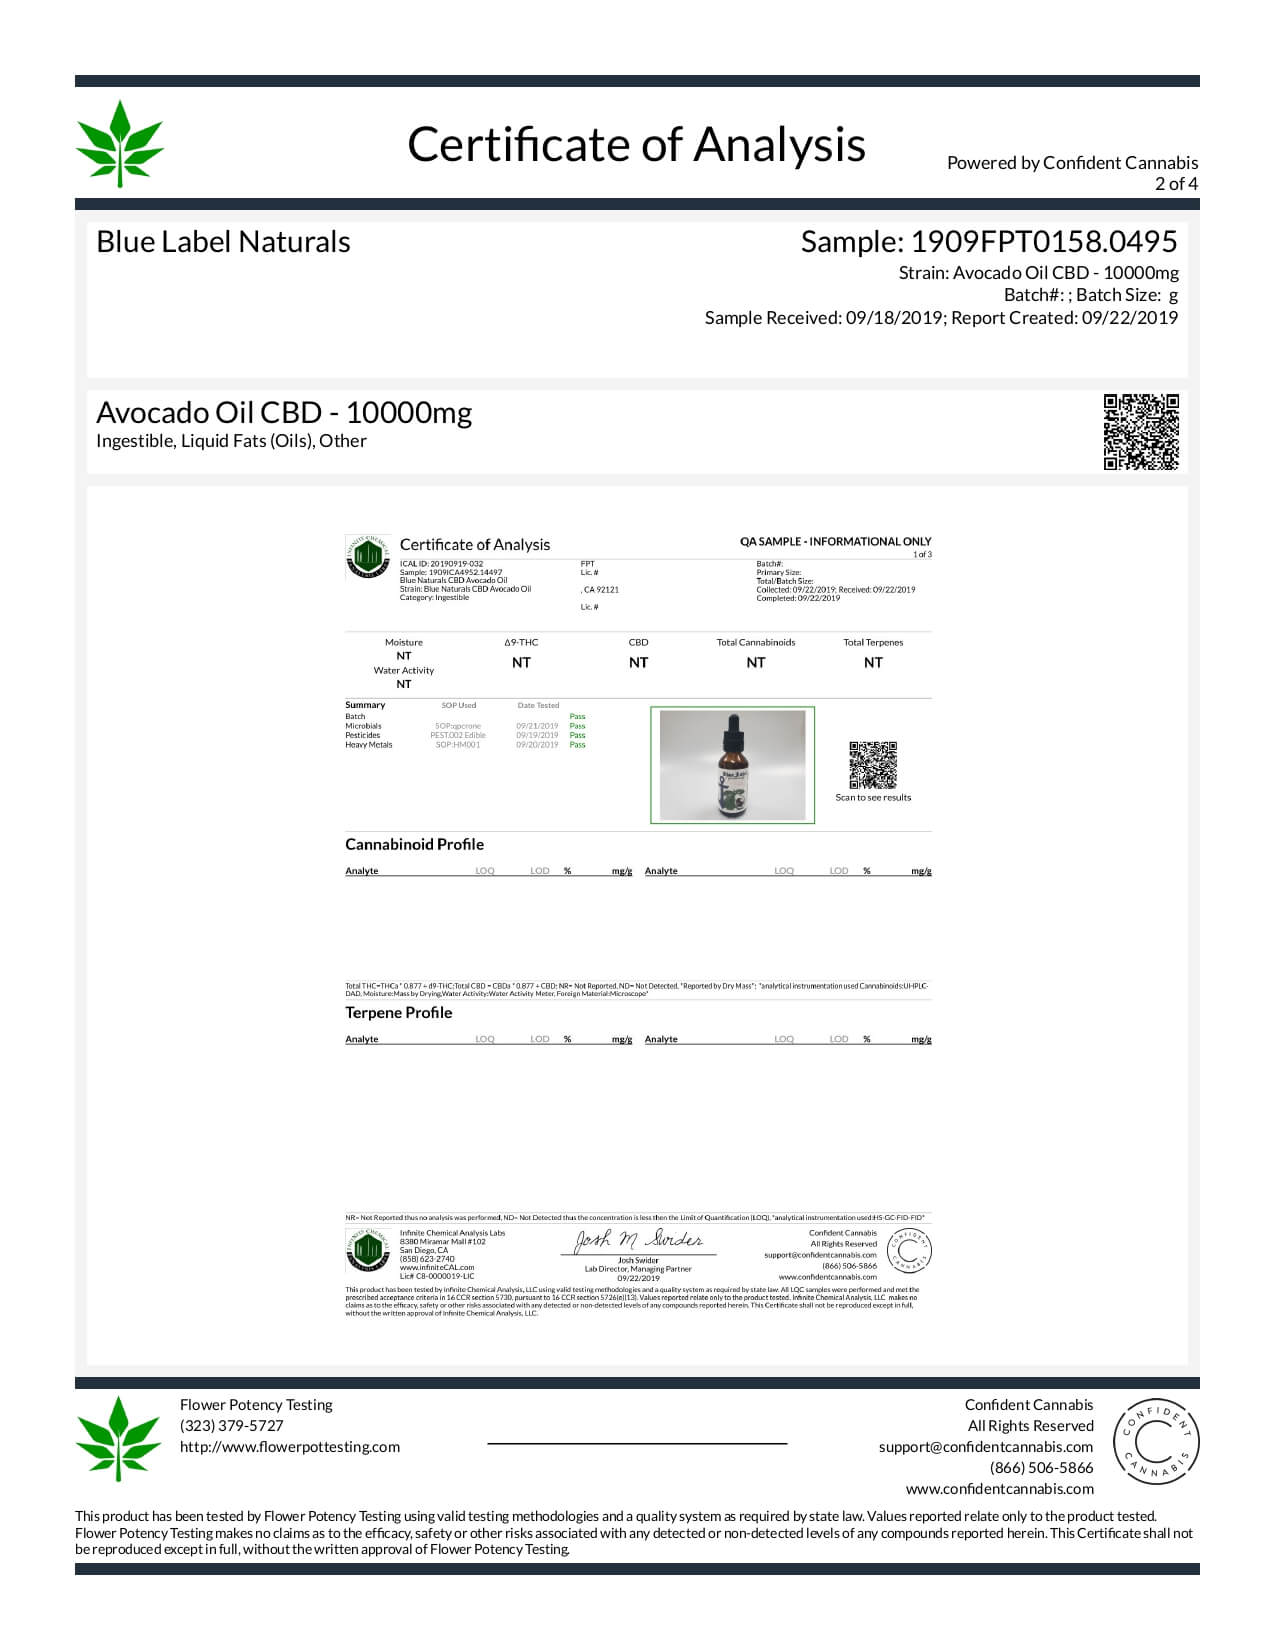 Blue Label CBD Tincture Organic Avocado 10000mg Lab Report